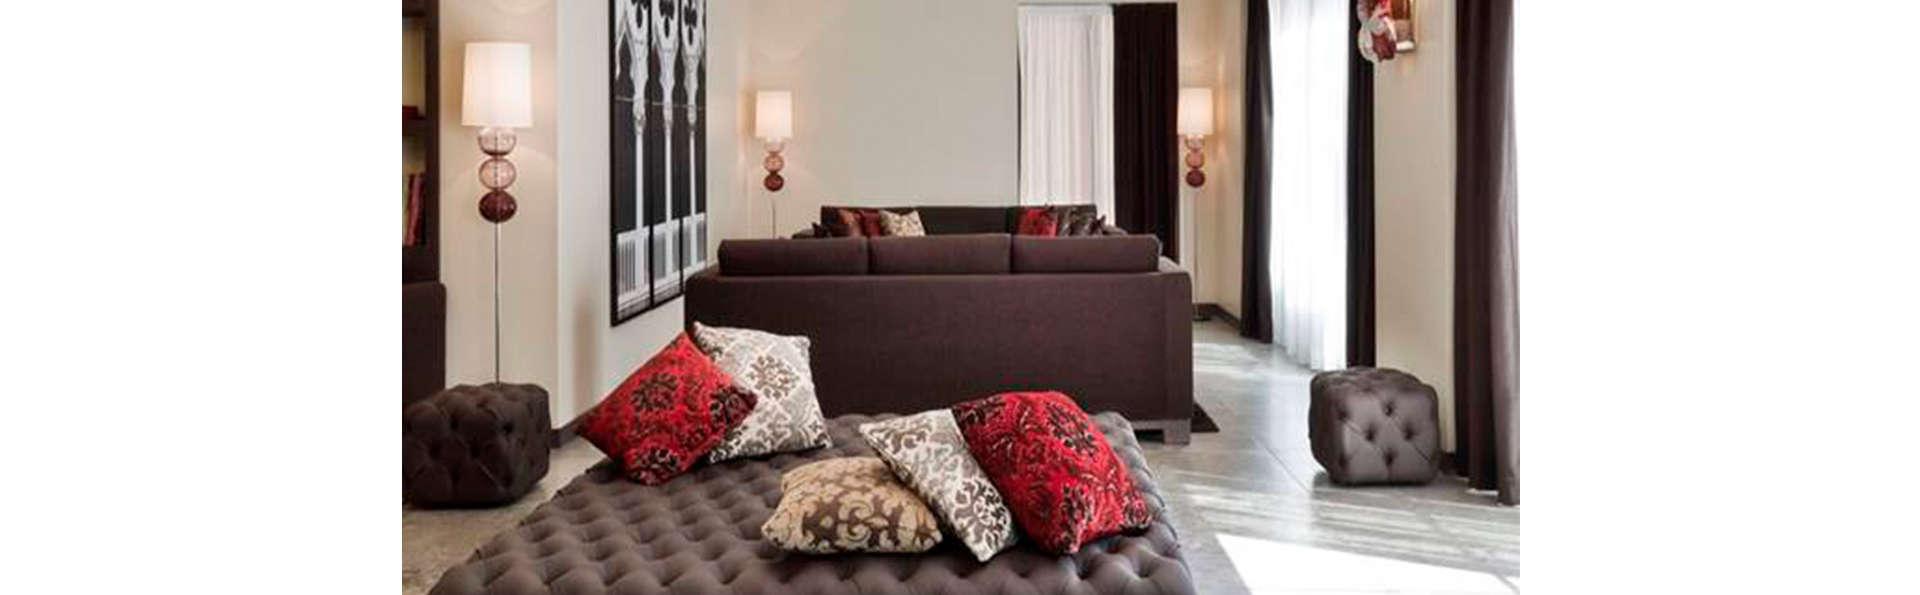 Hotel MGallery LaGare - EDIT_N_LOOBY.jpg